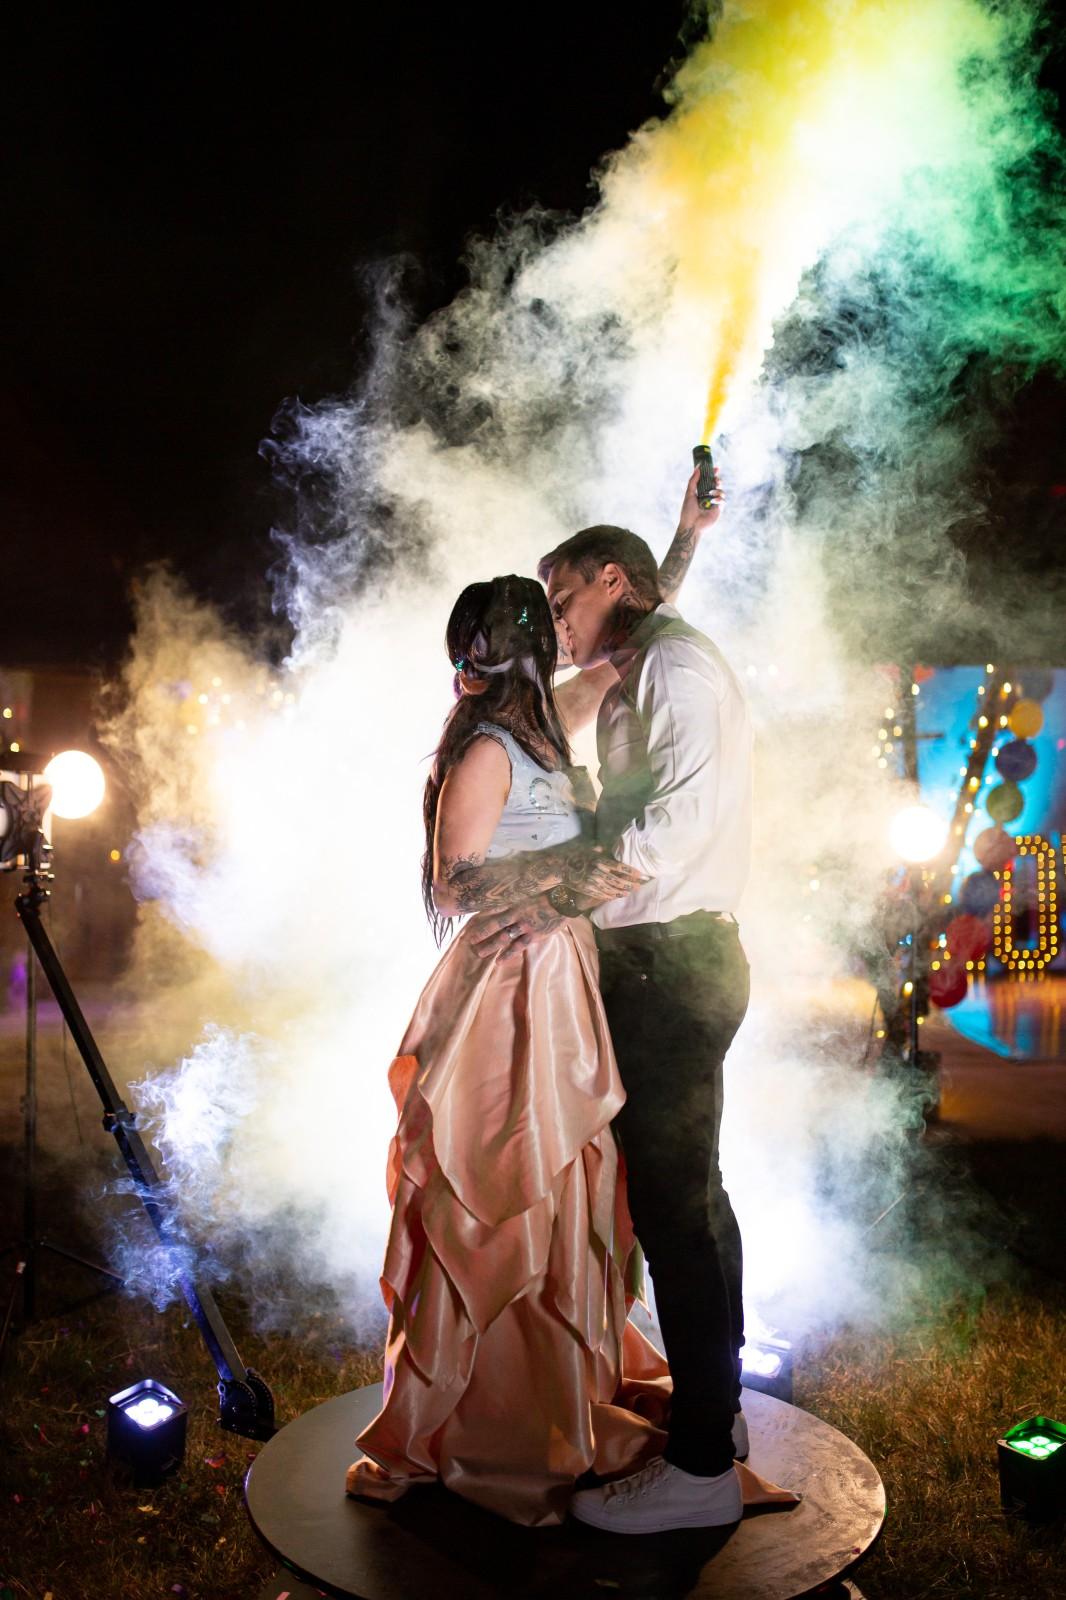 rainbow festival wedding -fun wedding photos - bride and groom with smoke bomb